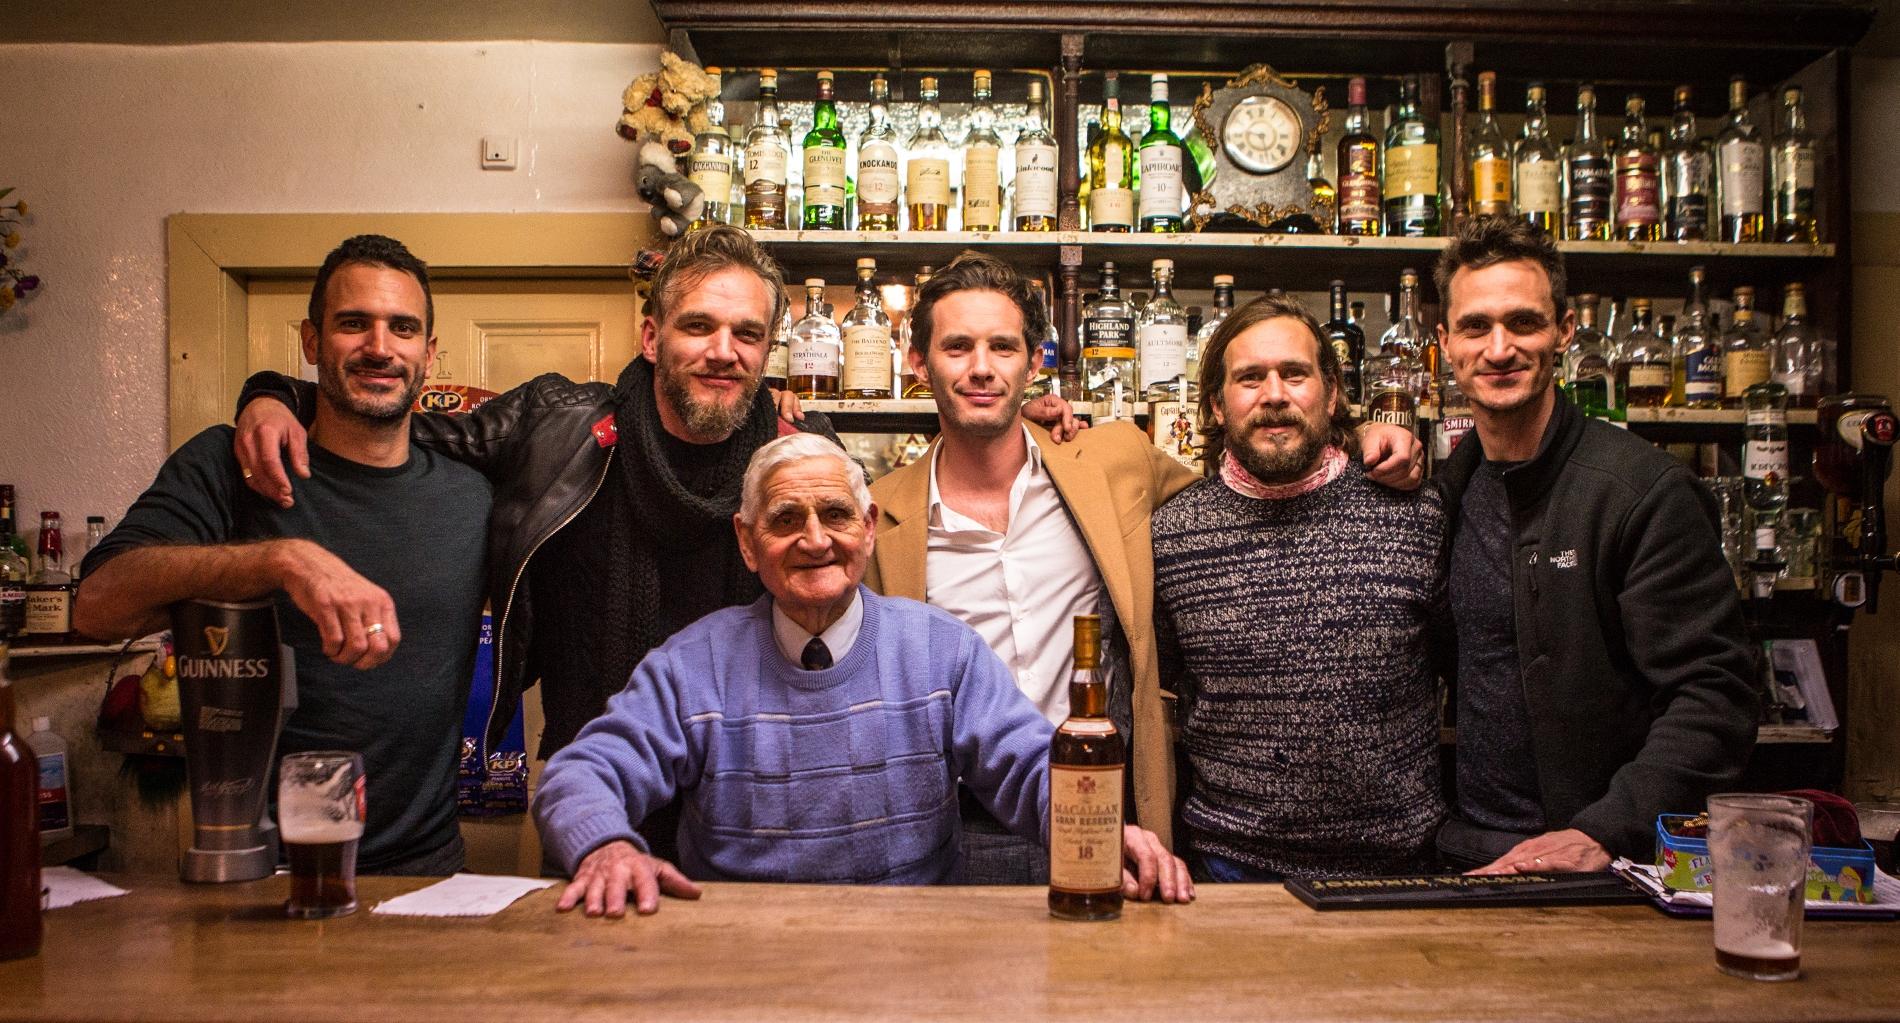 On location filming in the legendary Fiddich Side Inn with Speyside's finest landlord Joe Brandie RIP.